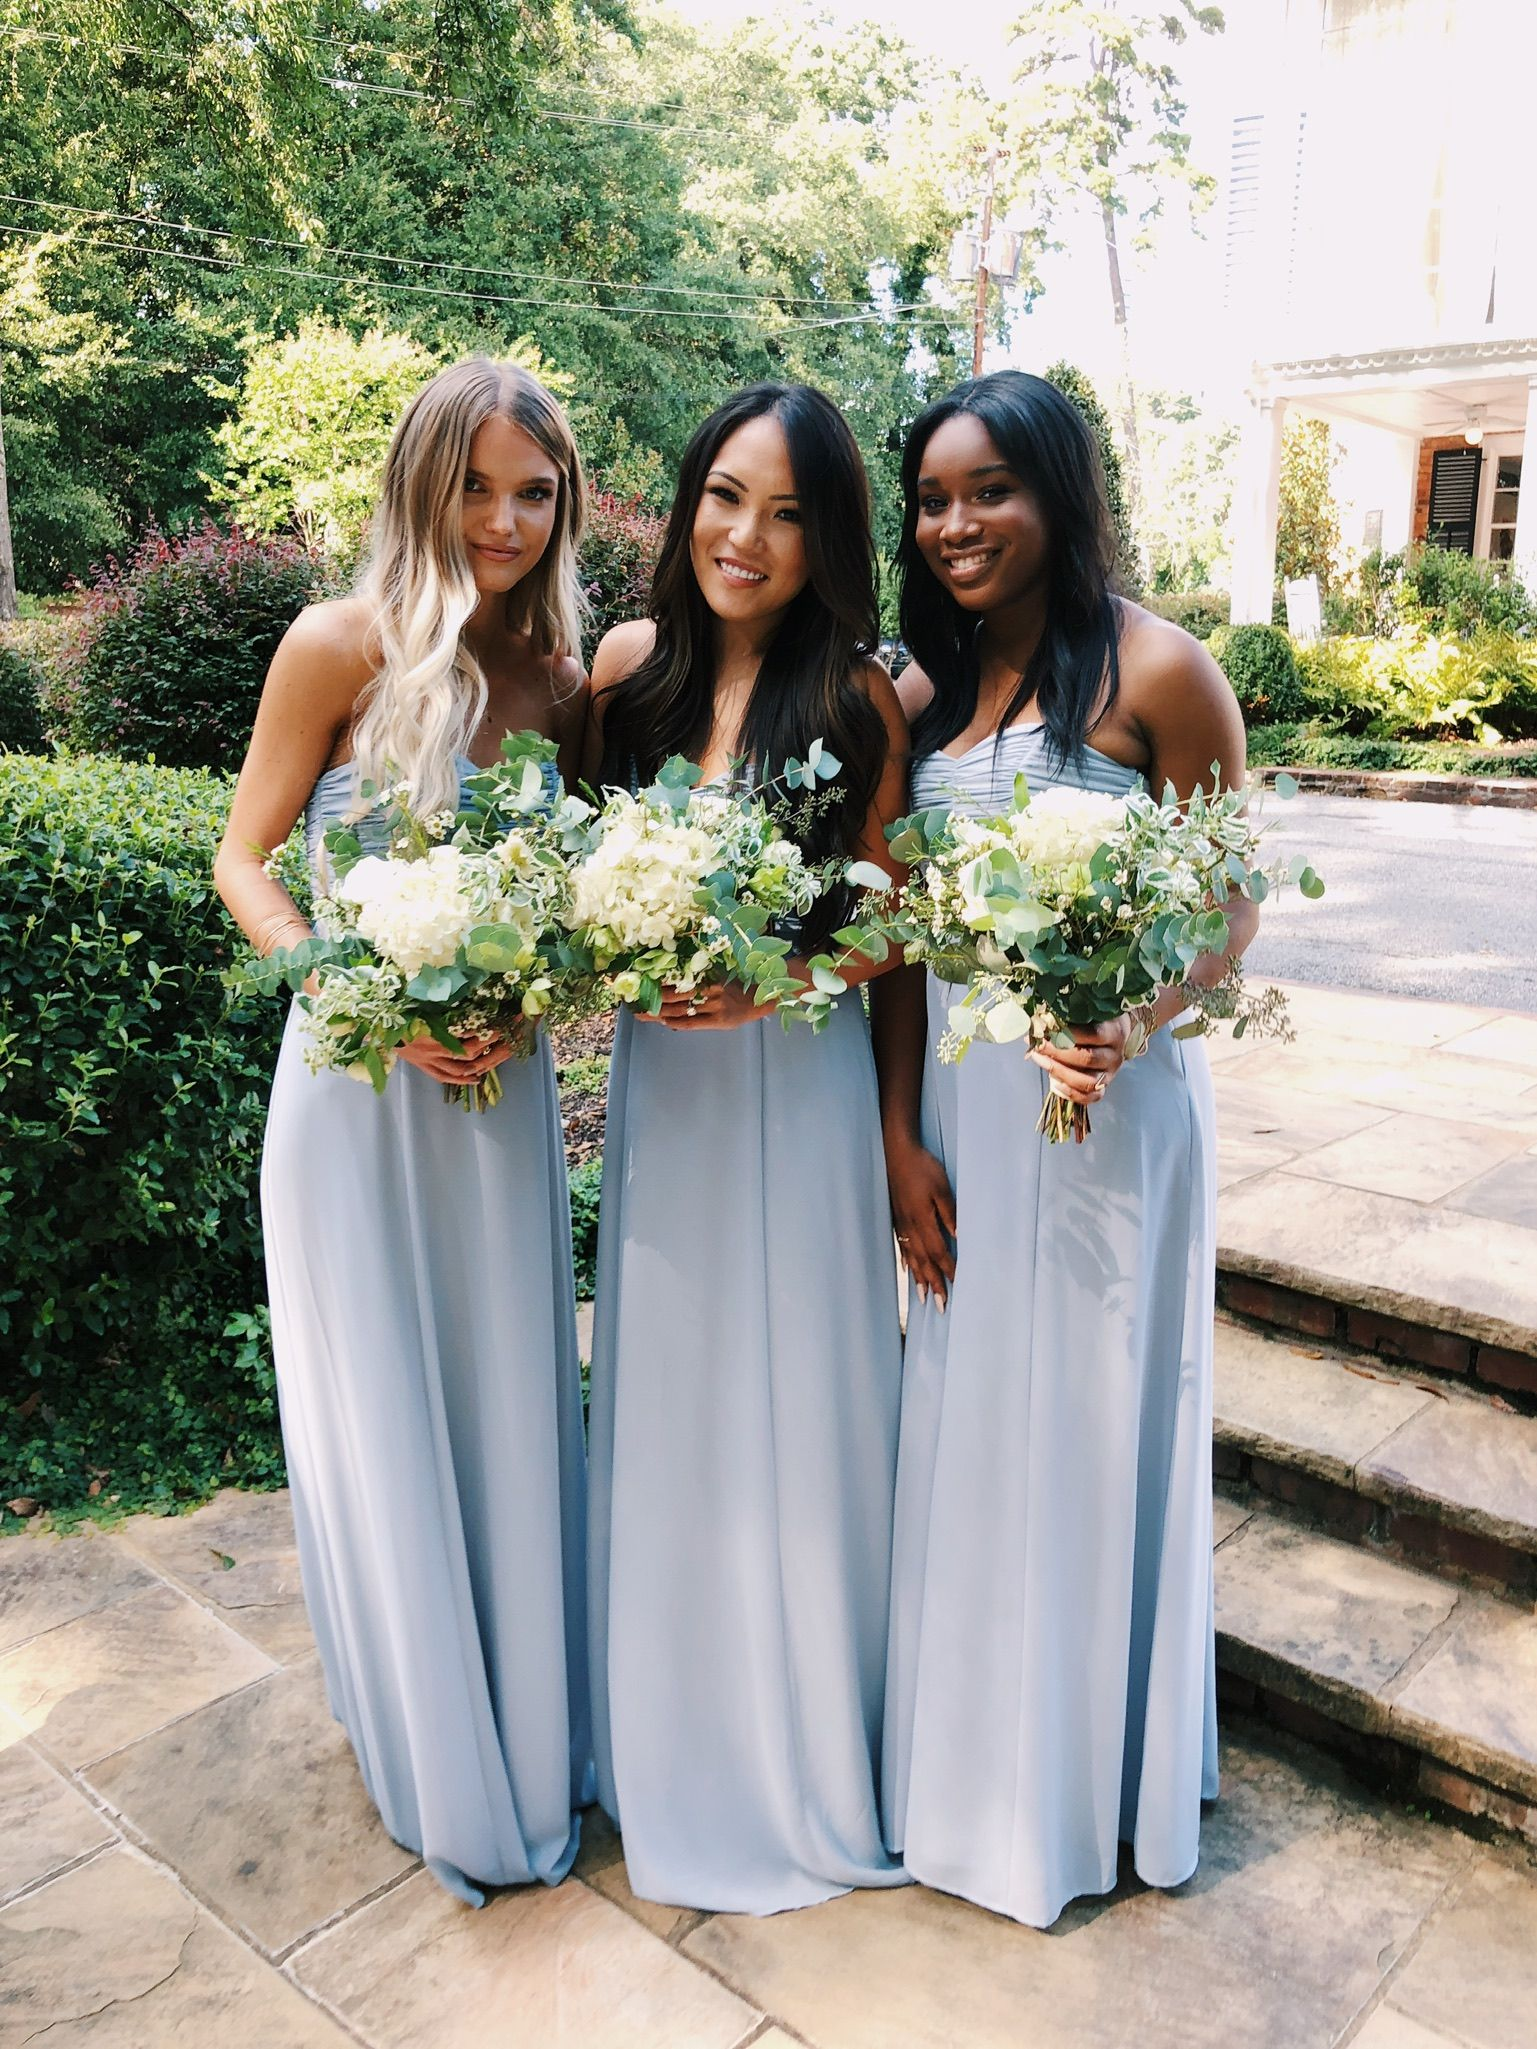 Bonbon Strapless Dress Steel Blue Chiffon Bridesmaid